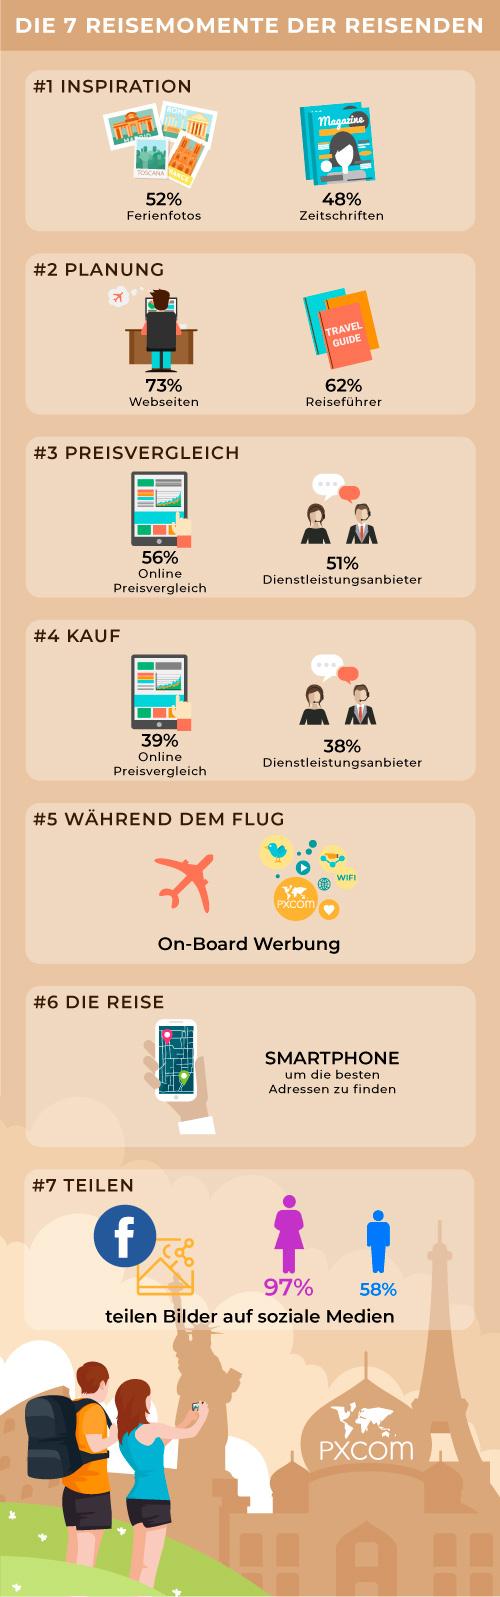 reisemomente tourismus tourismusprofis marketing